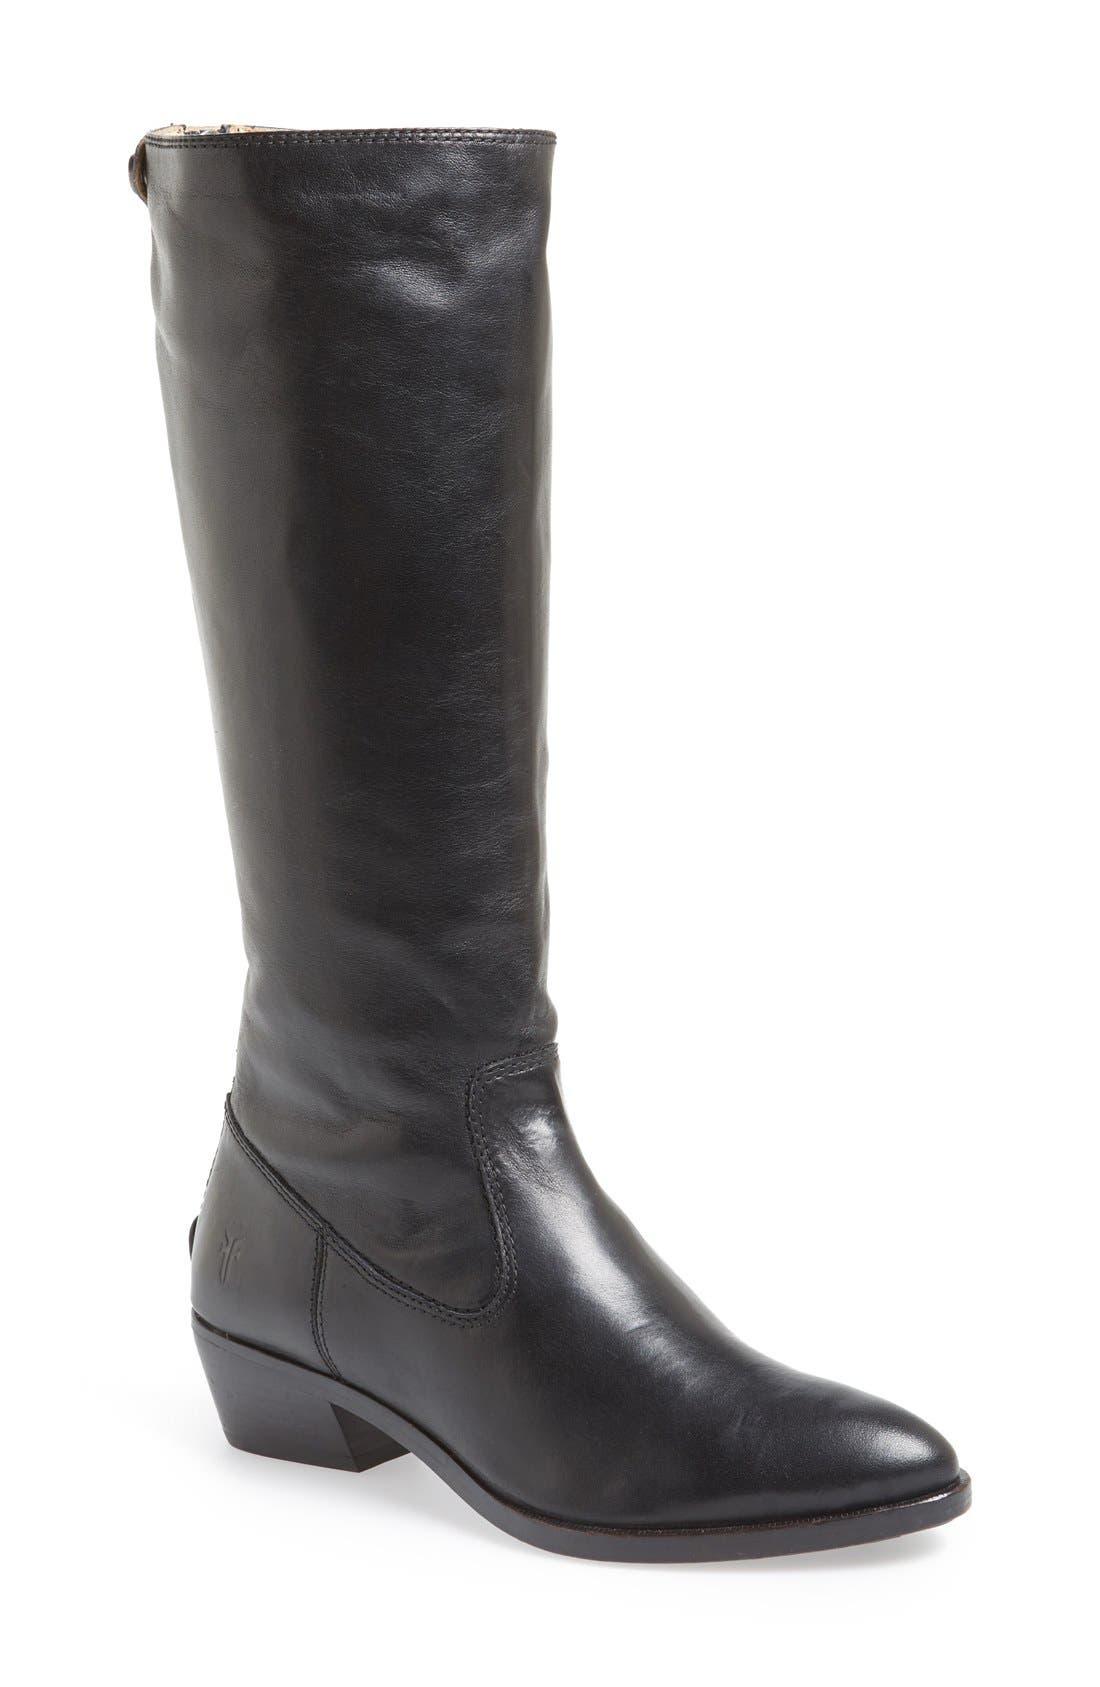 Main Image - Frye 'Ruby' Tall Boot (Women)